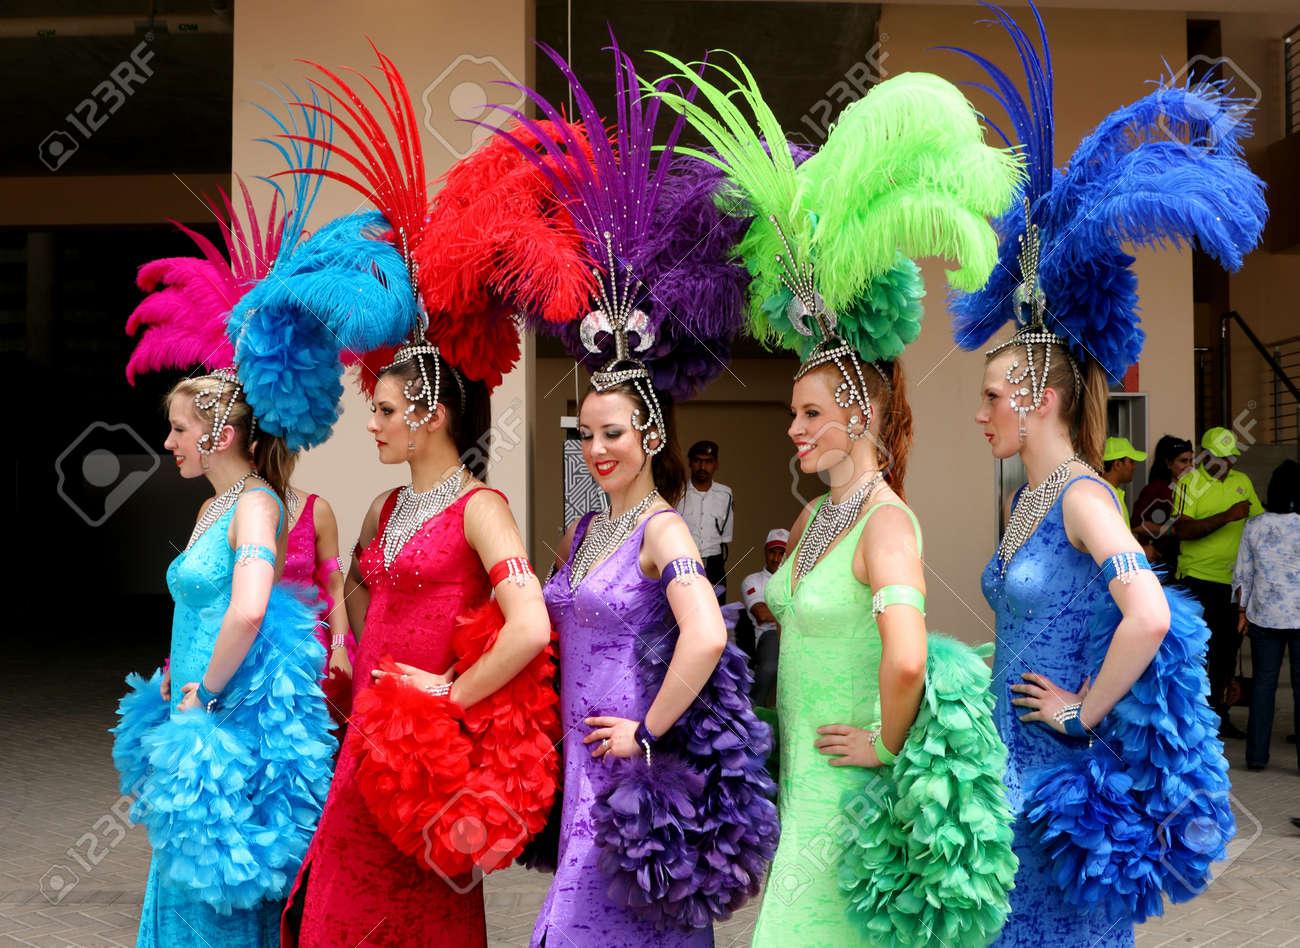 Bahrain Women Dress Women in Colourful Dress